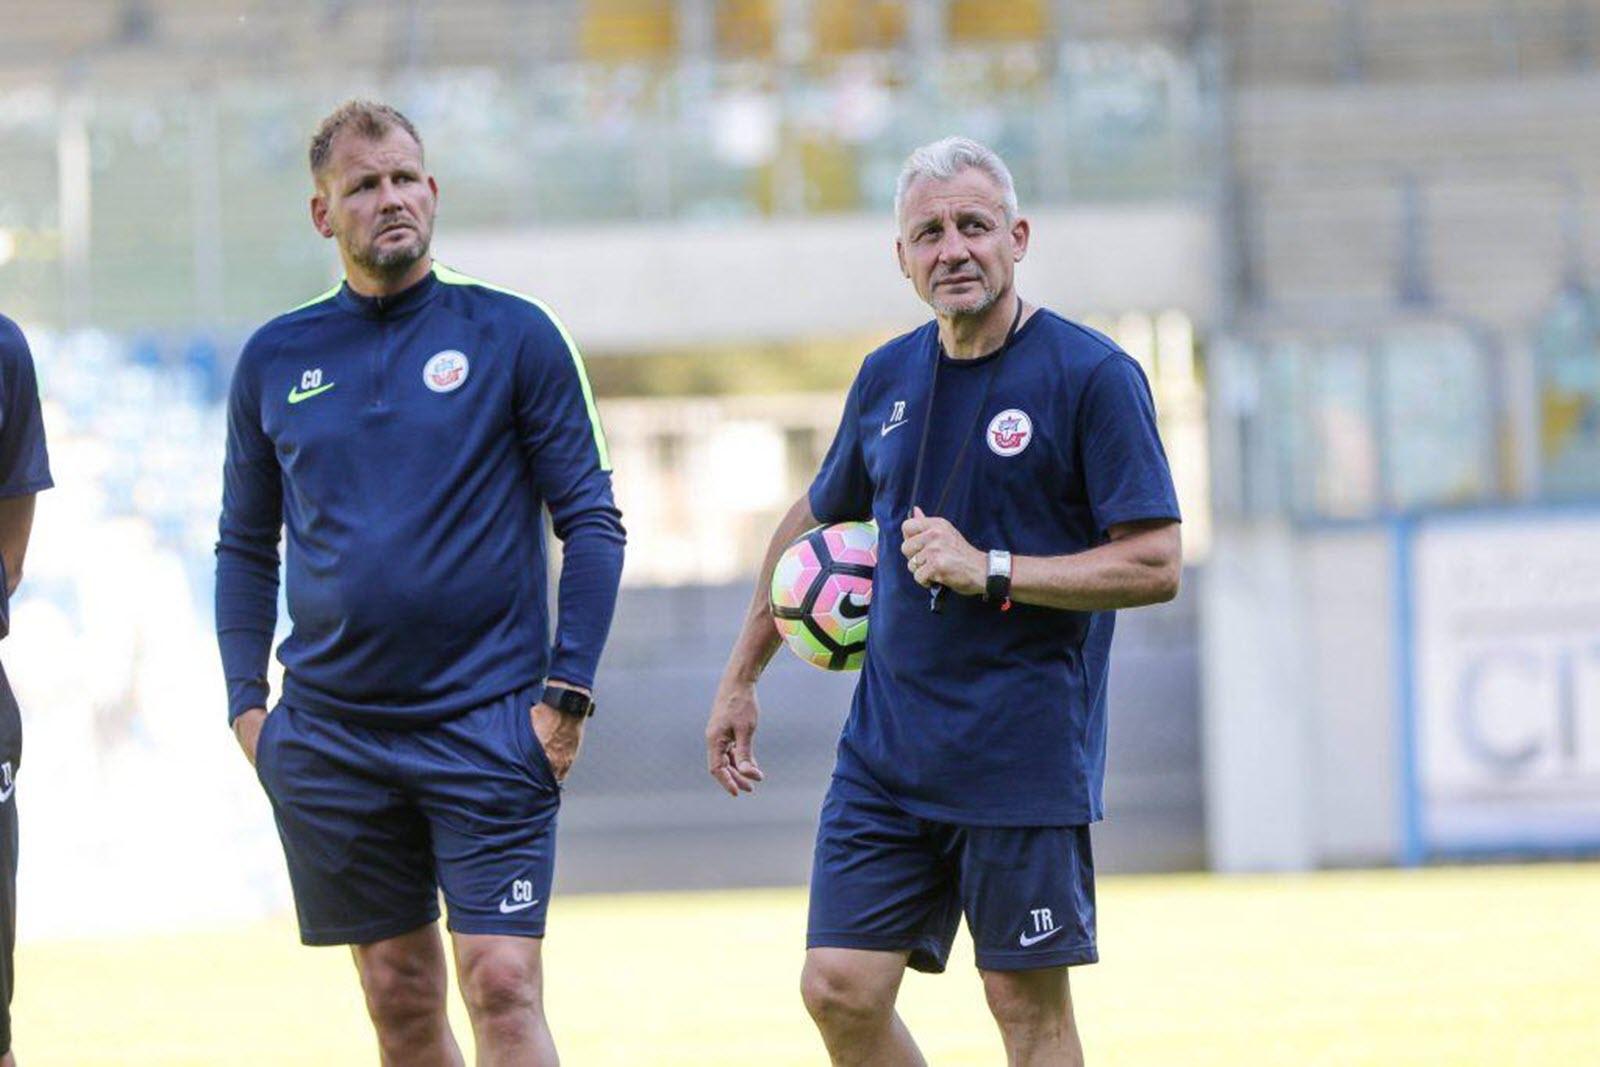 Uwe Ehlers (links) und Pavel Dotchev auf dem Trainingsplatz.